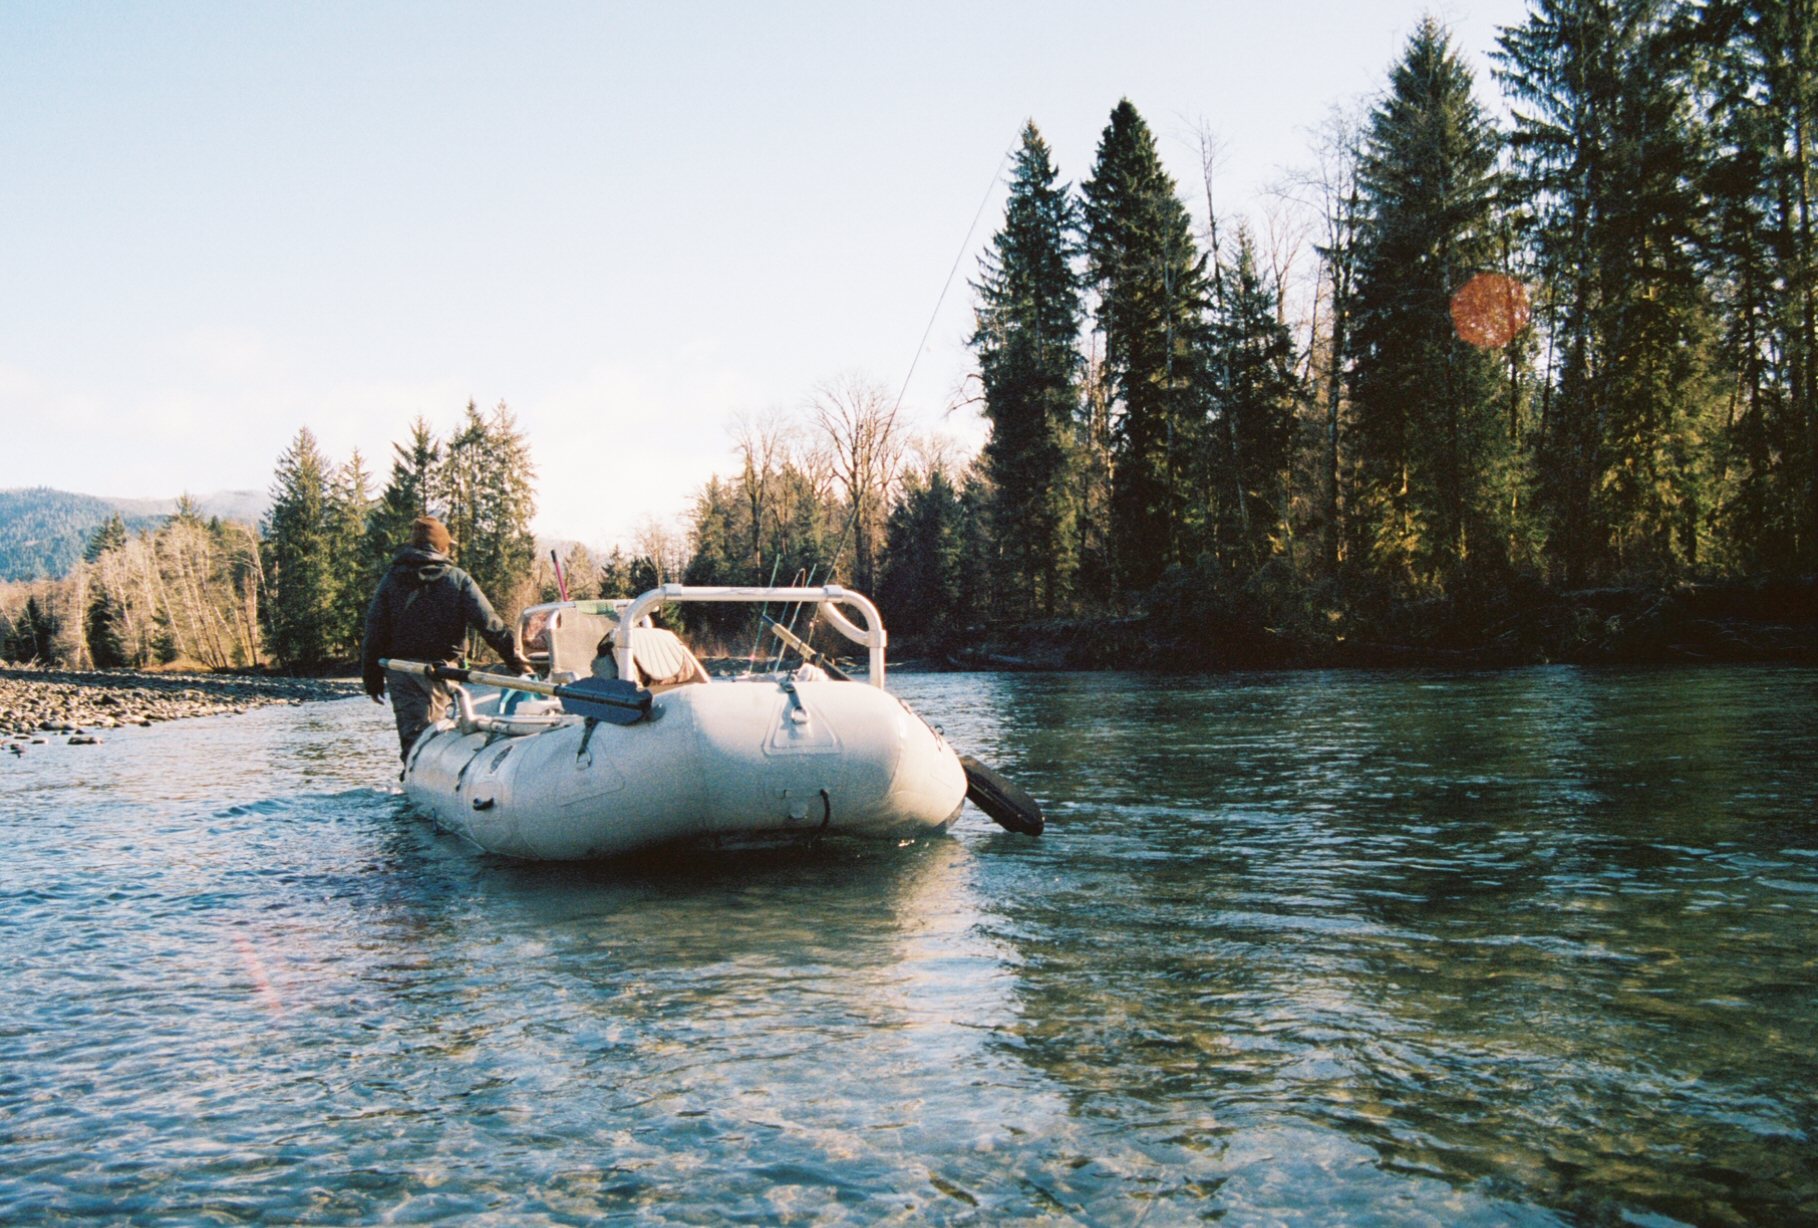 Hoh River, Washington